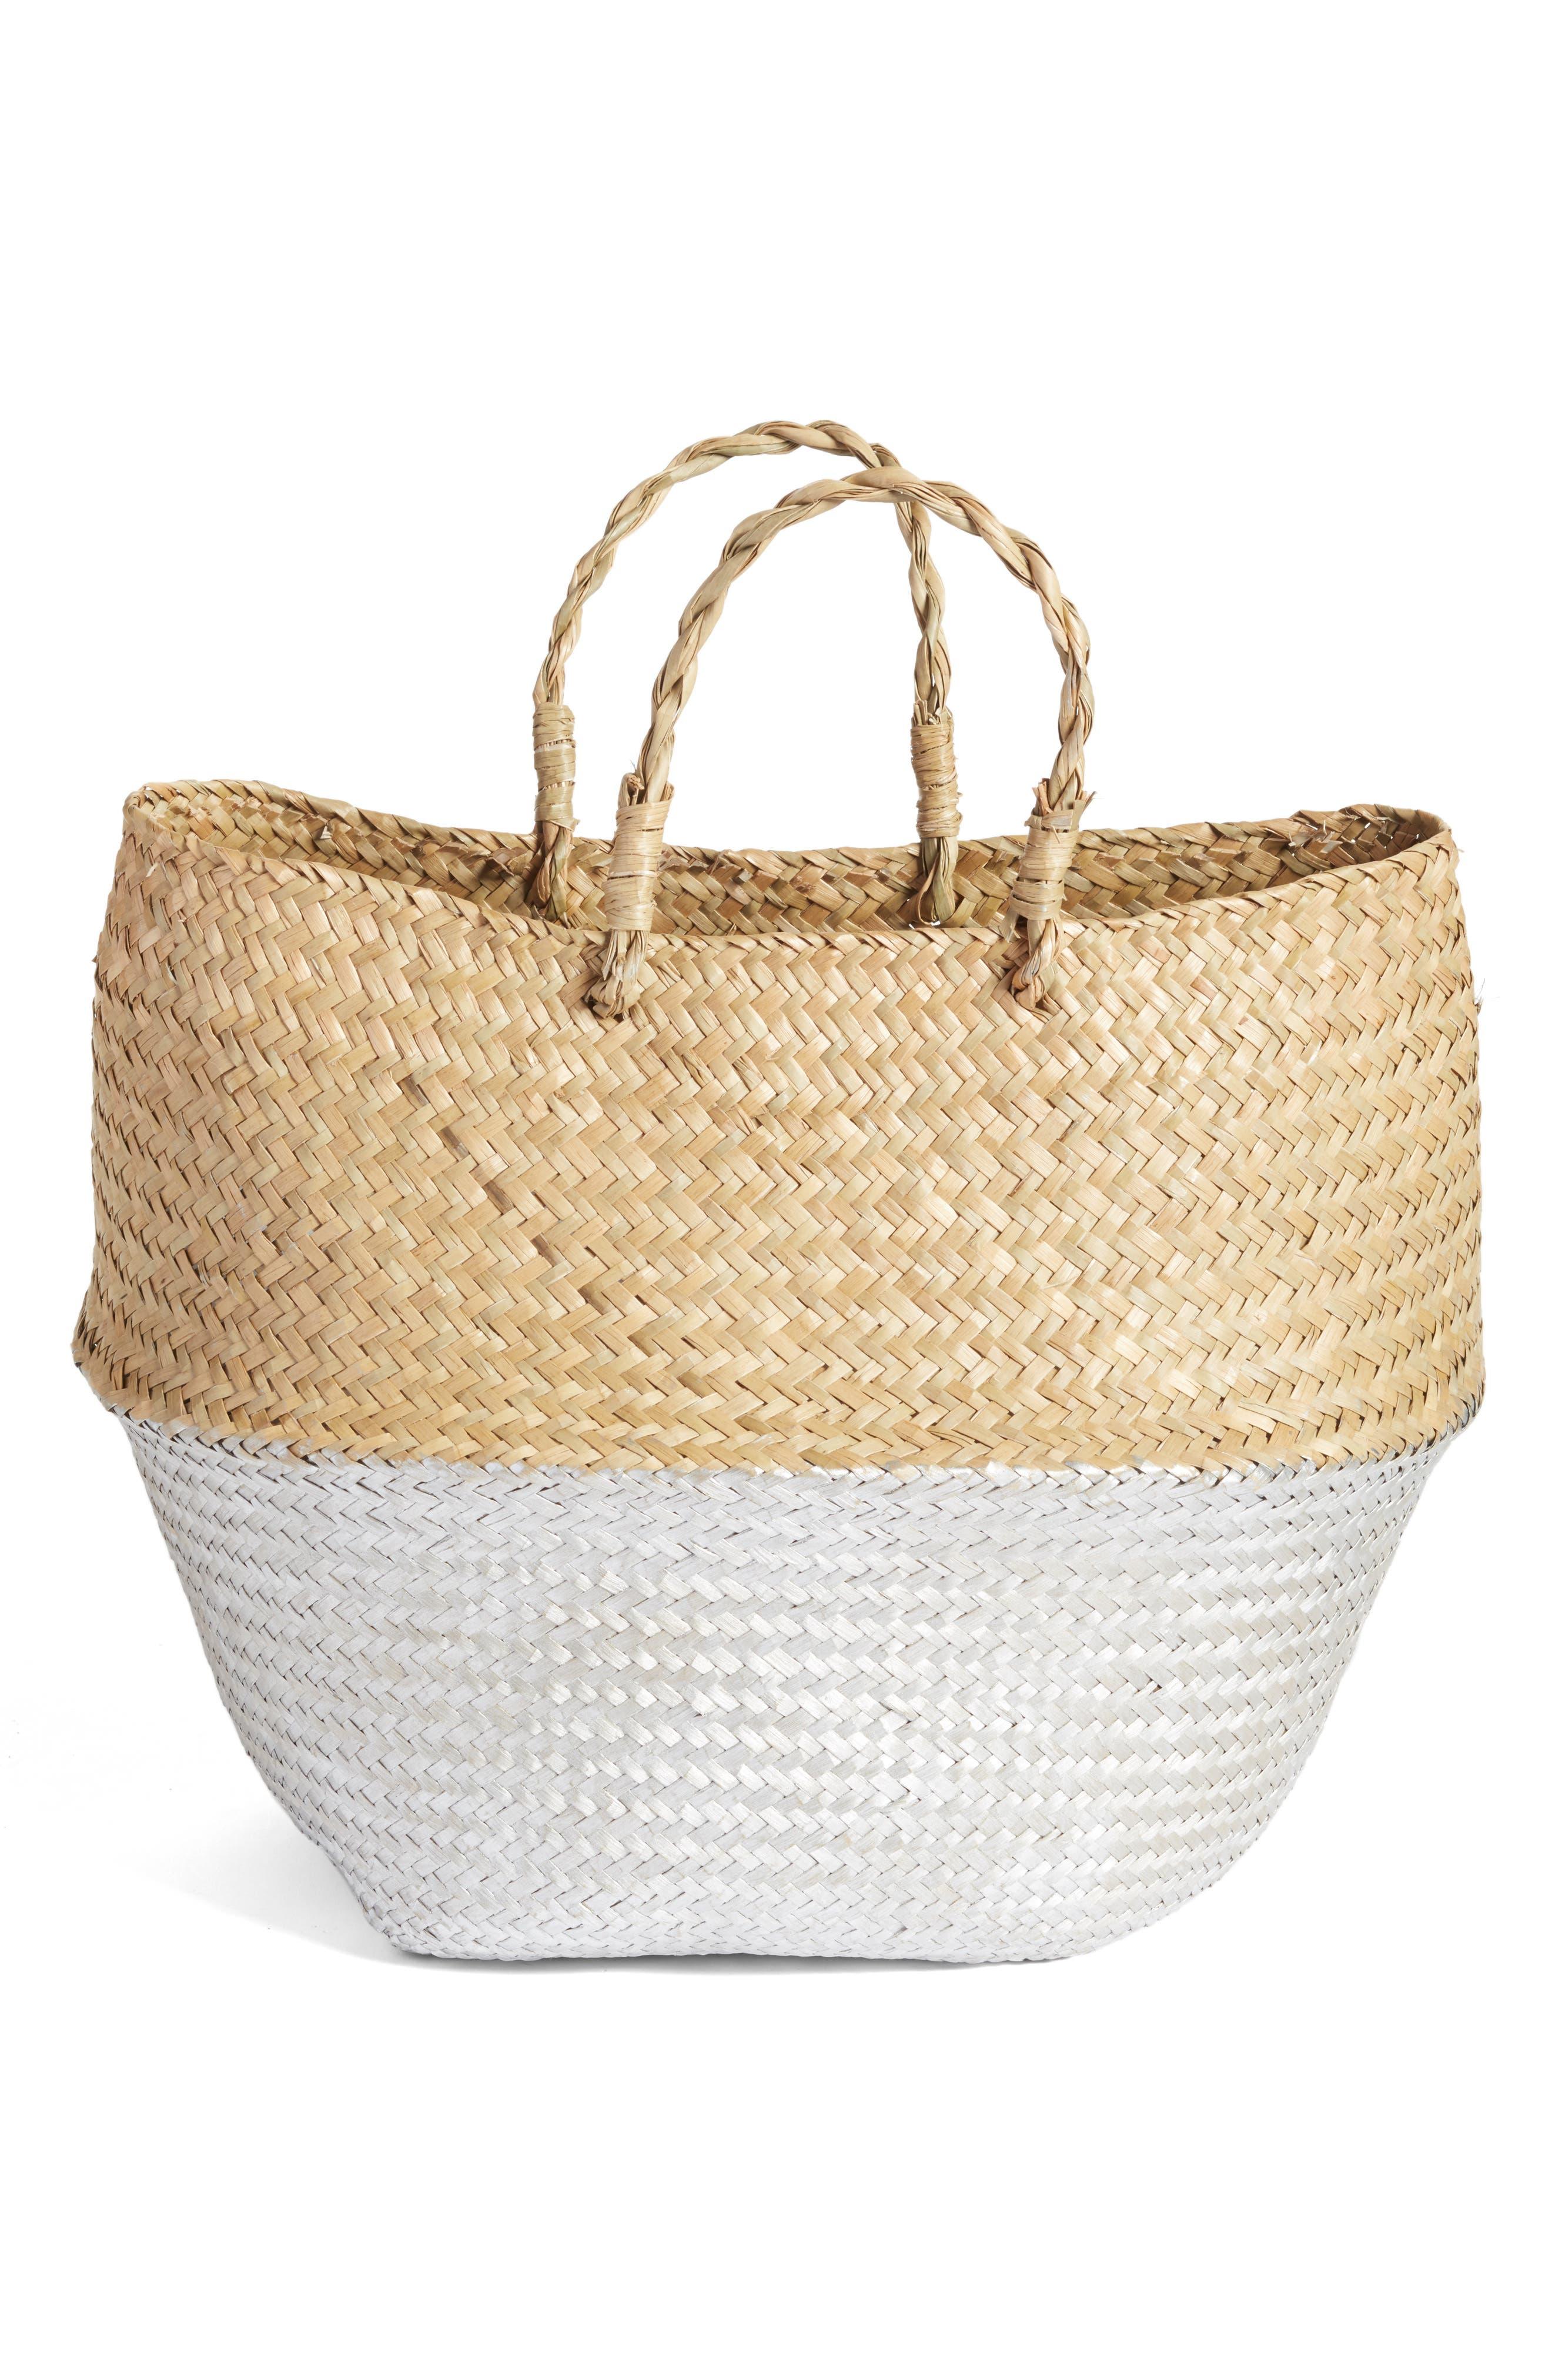 Two-Tone Metallic Straw Basket,                         Main,                         color, Metallic Silver